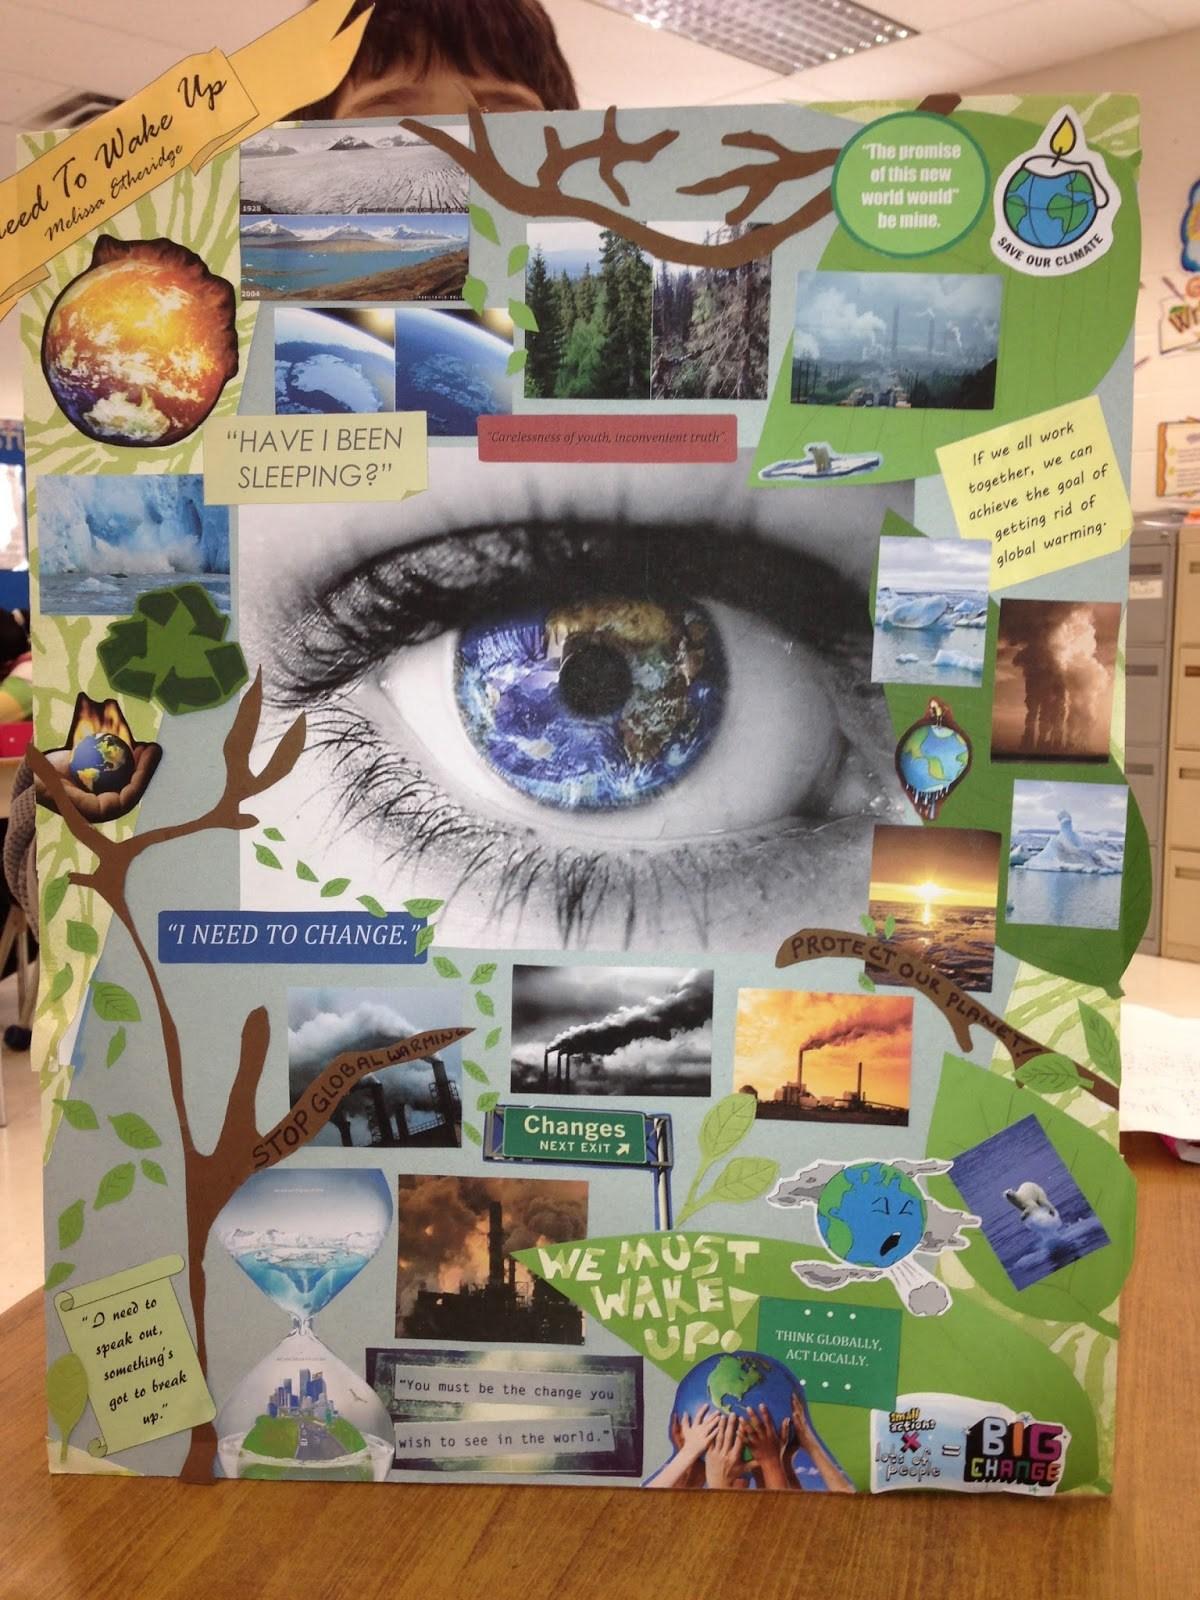 010 Visual Essay Example Vv Make Photo Gallery Shocking Response Examples Literacy Arts Full